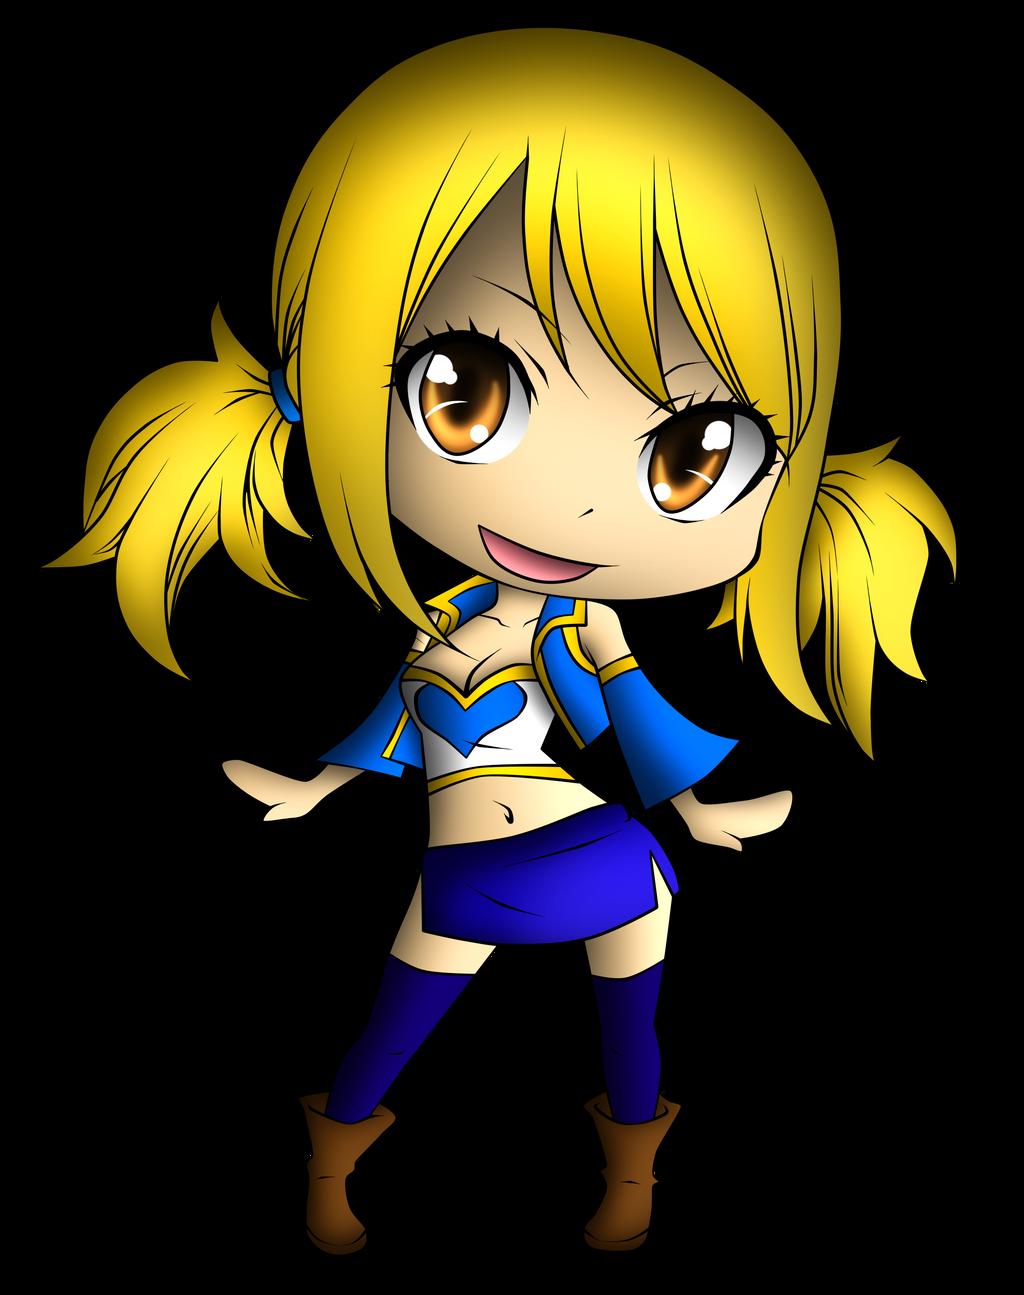 Fairy Tail - Chibi Lucy Heartfilia by Evilash-Zutara-17 on ...